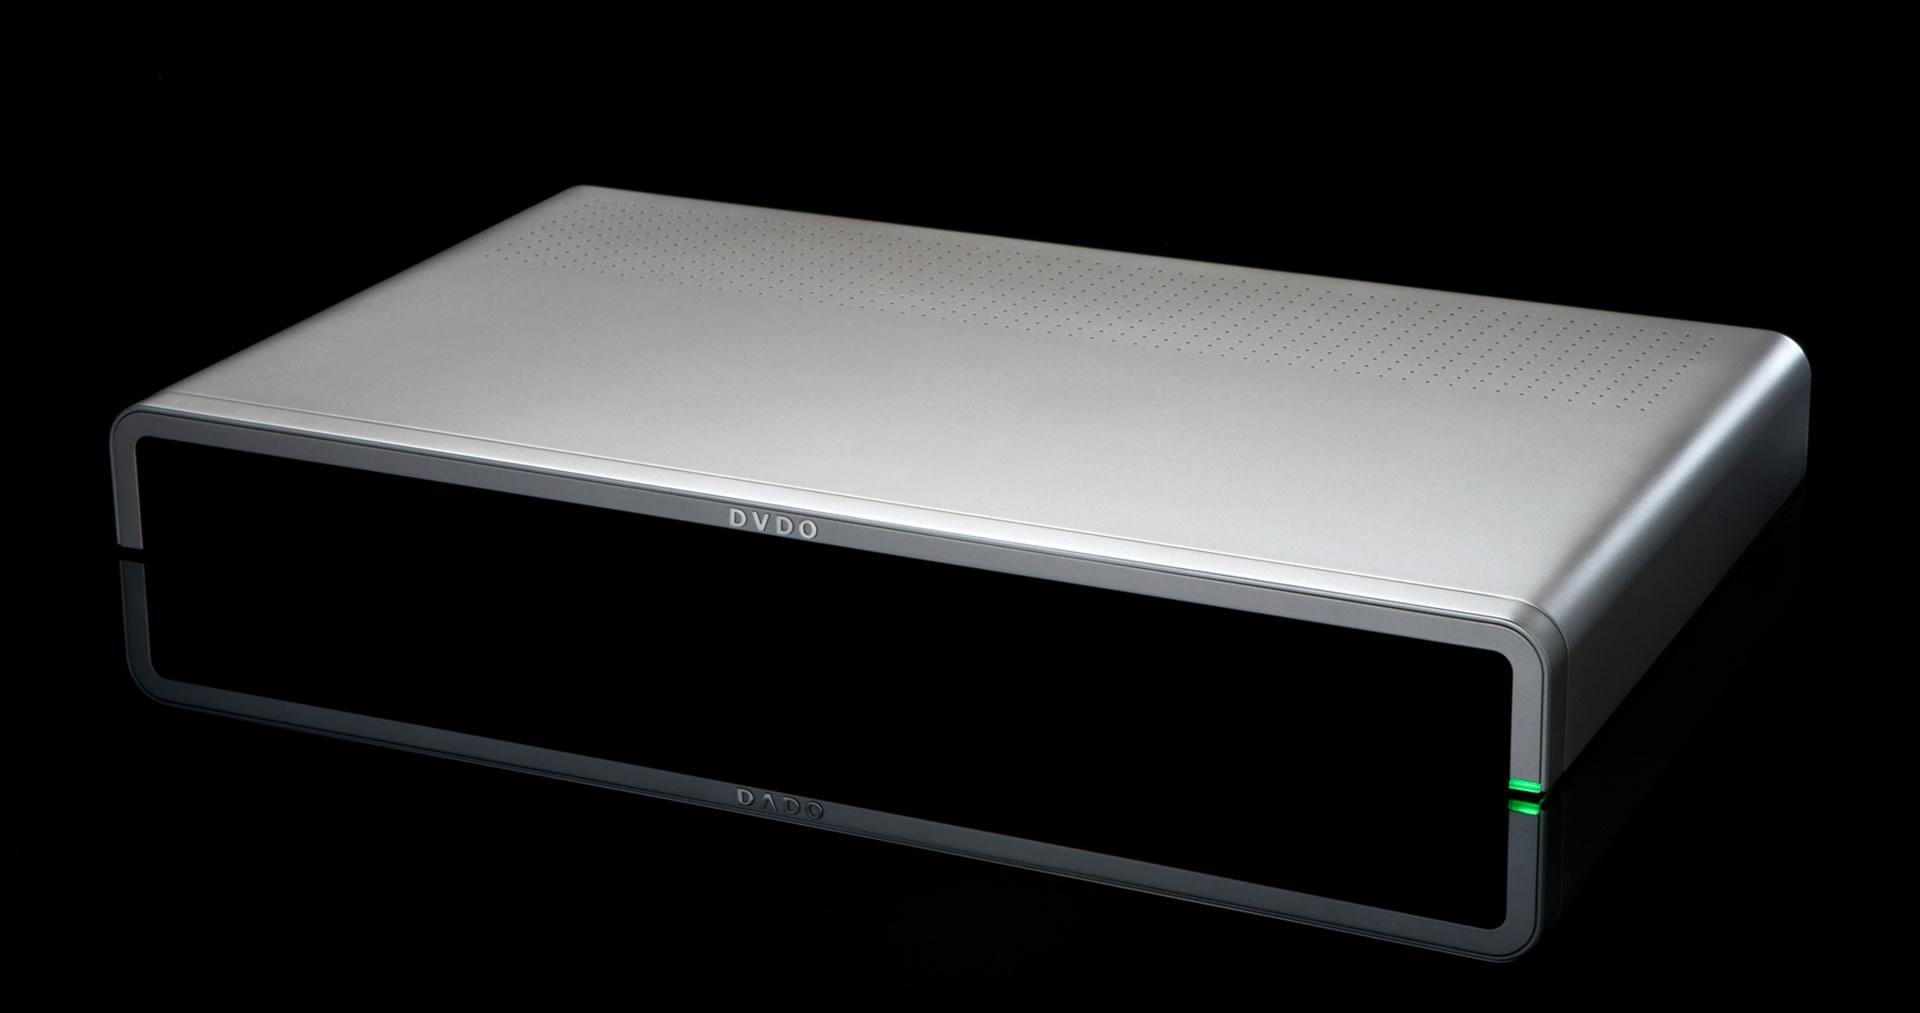 DVDO Edge HD video processor on black background